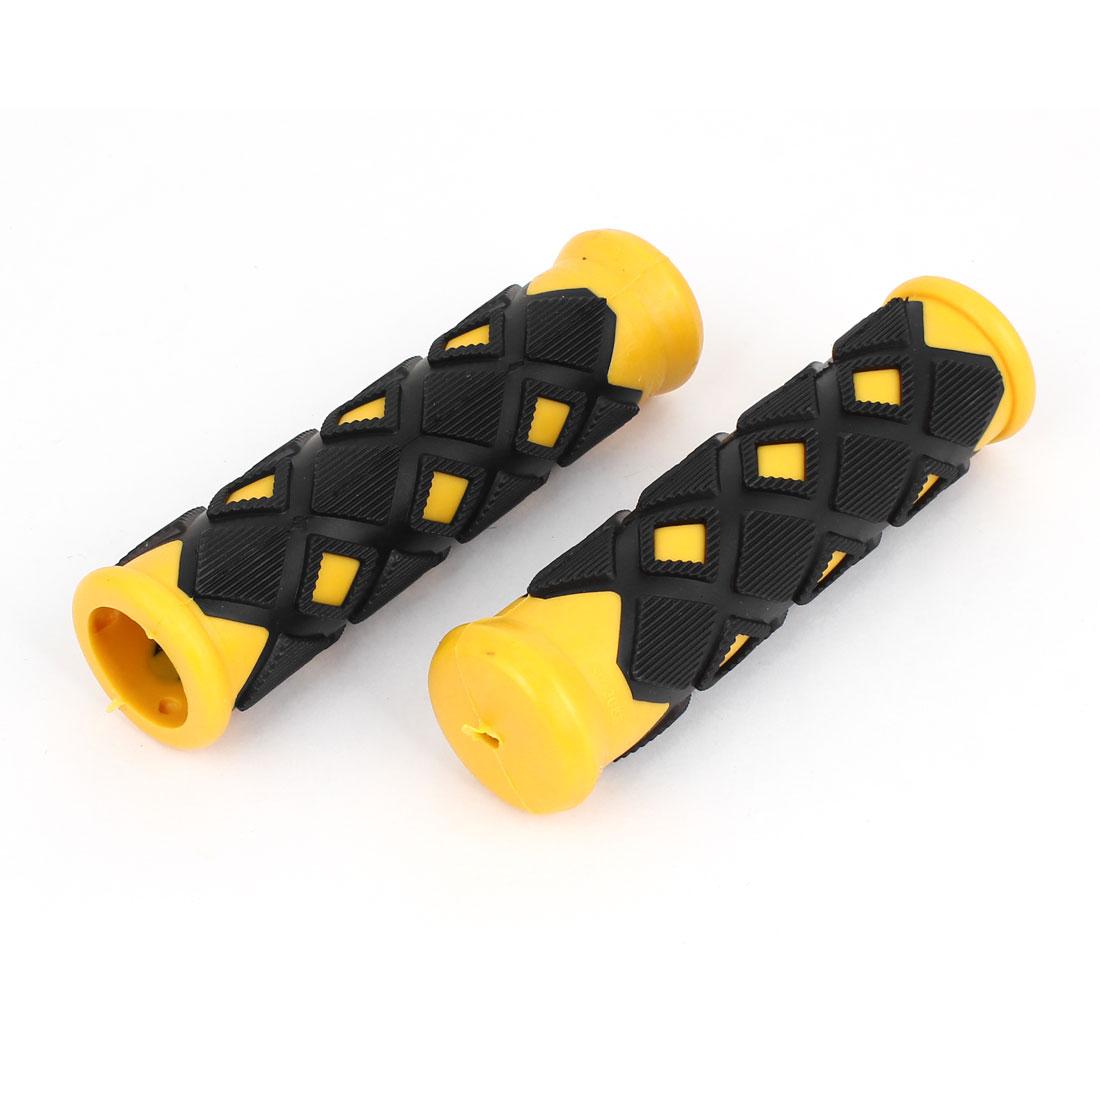 2 Pcs Lozenge Shaped Black Yellow Non Slip Rubber Bike Bicycle Handlebar Grip